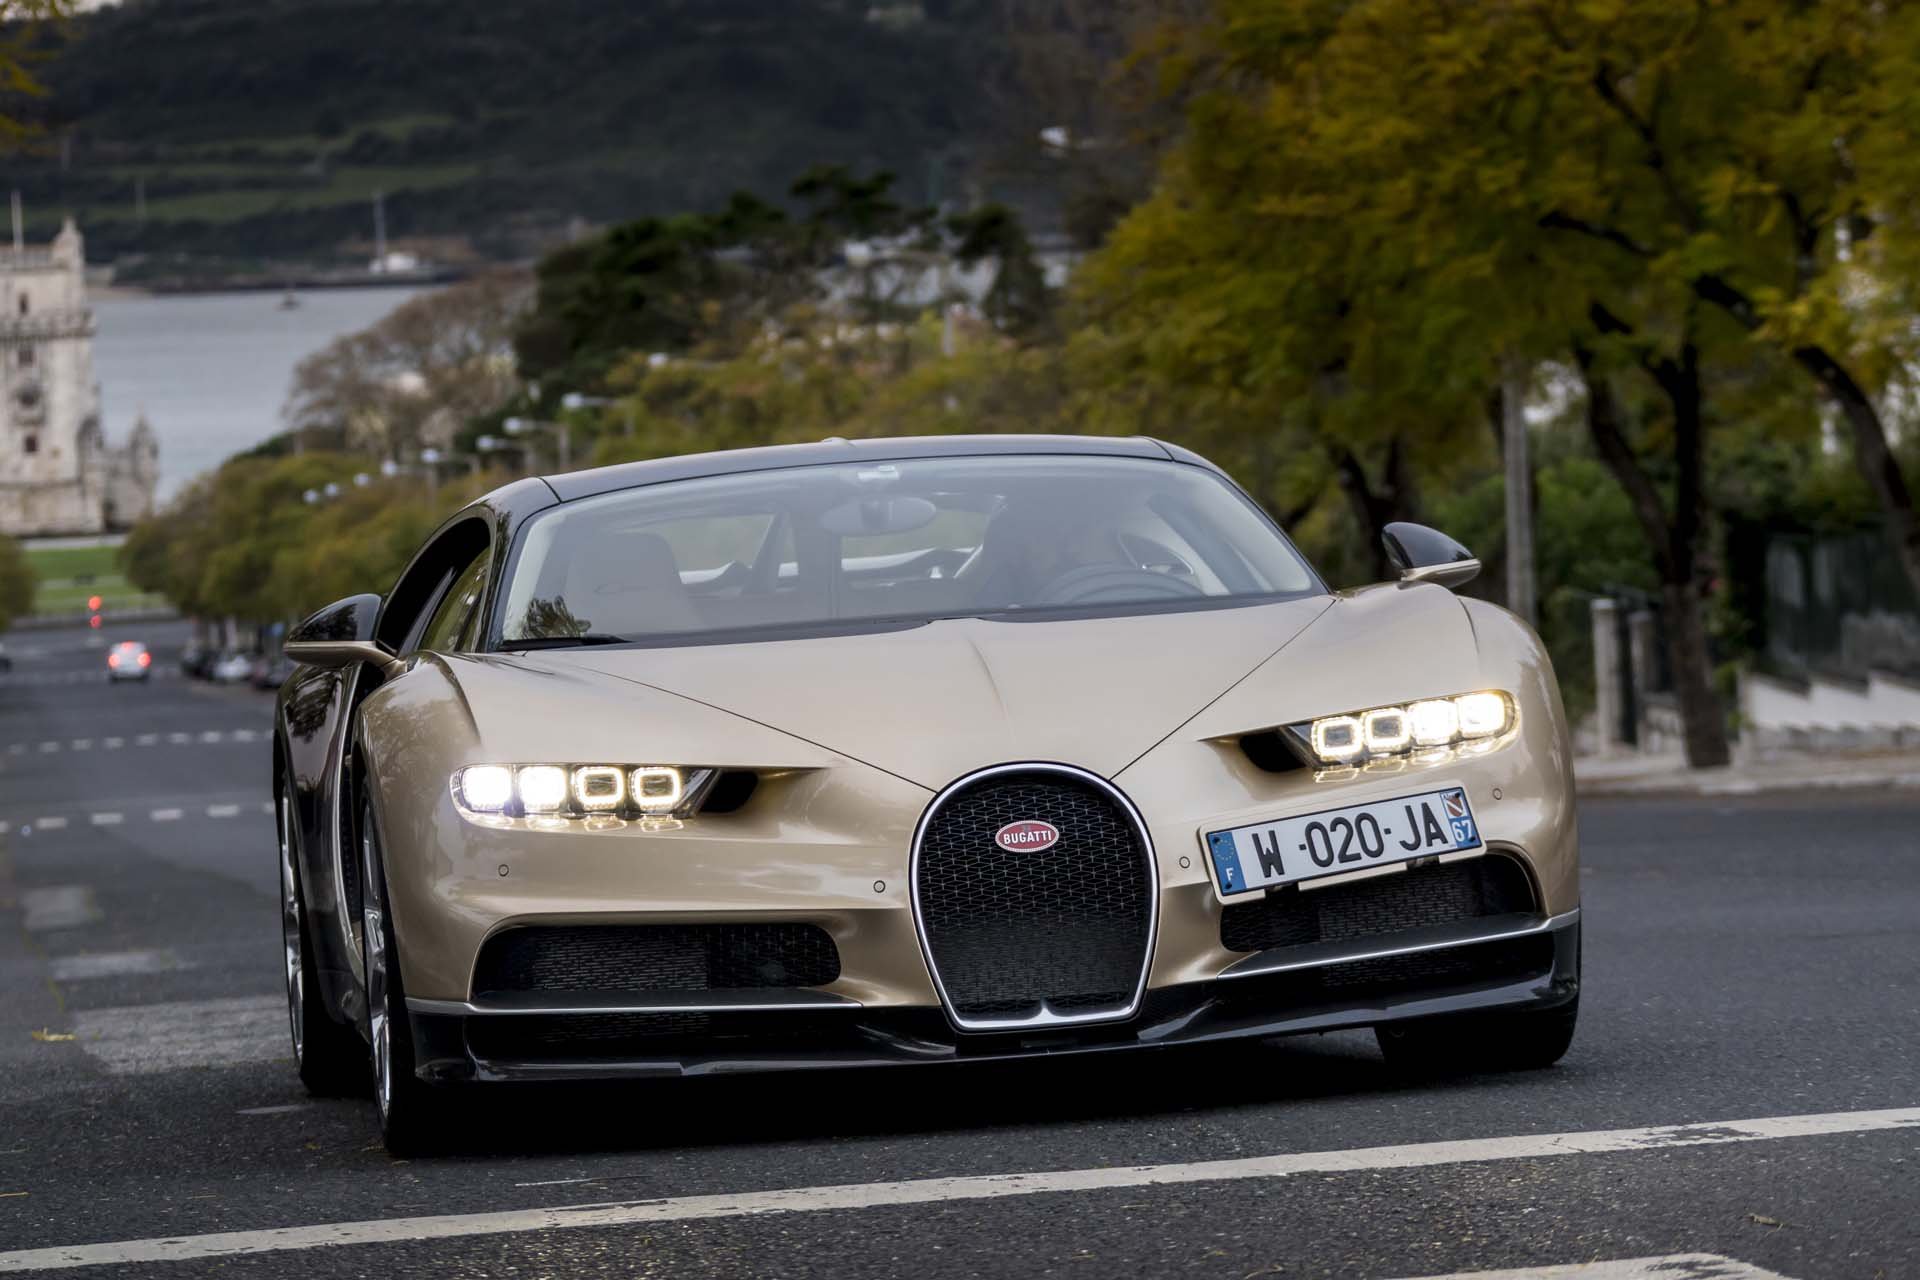 Bugatti Chiron Reviewed Lagonda Brand Confirmed Putins